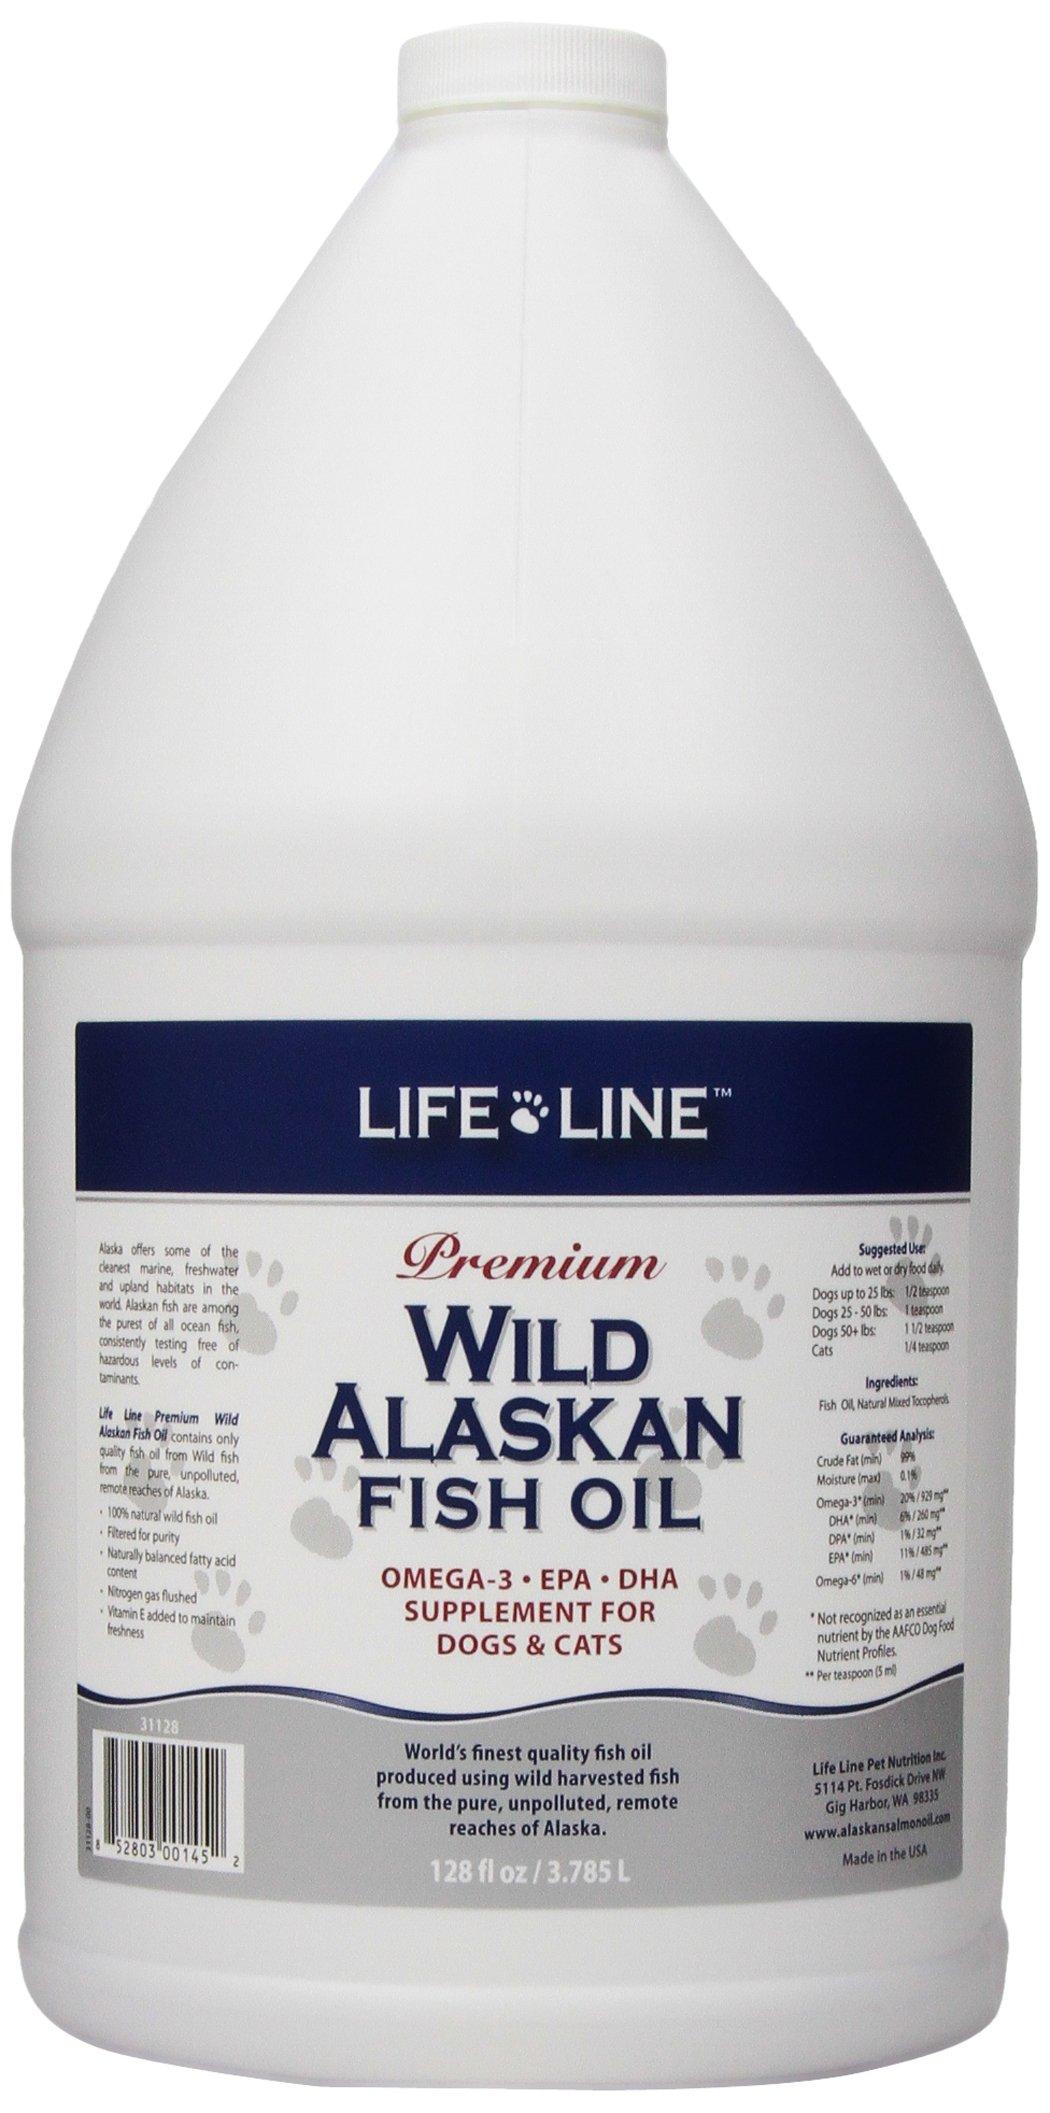 Life line wild alaskan fish oil 128 ounce chickadee for Quality fish oil